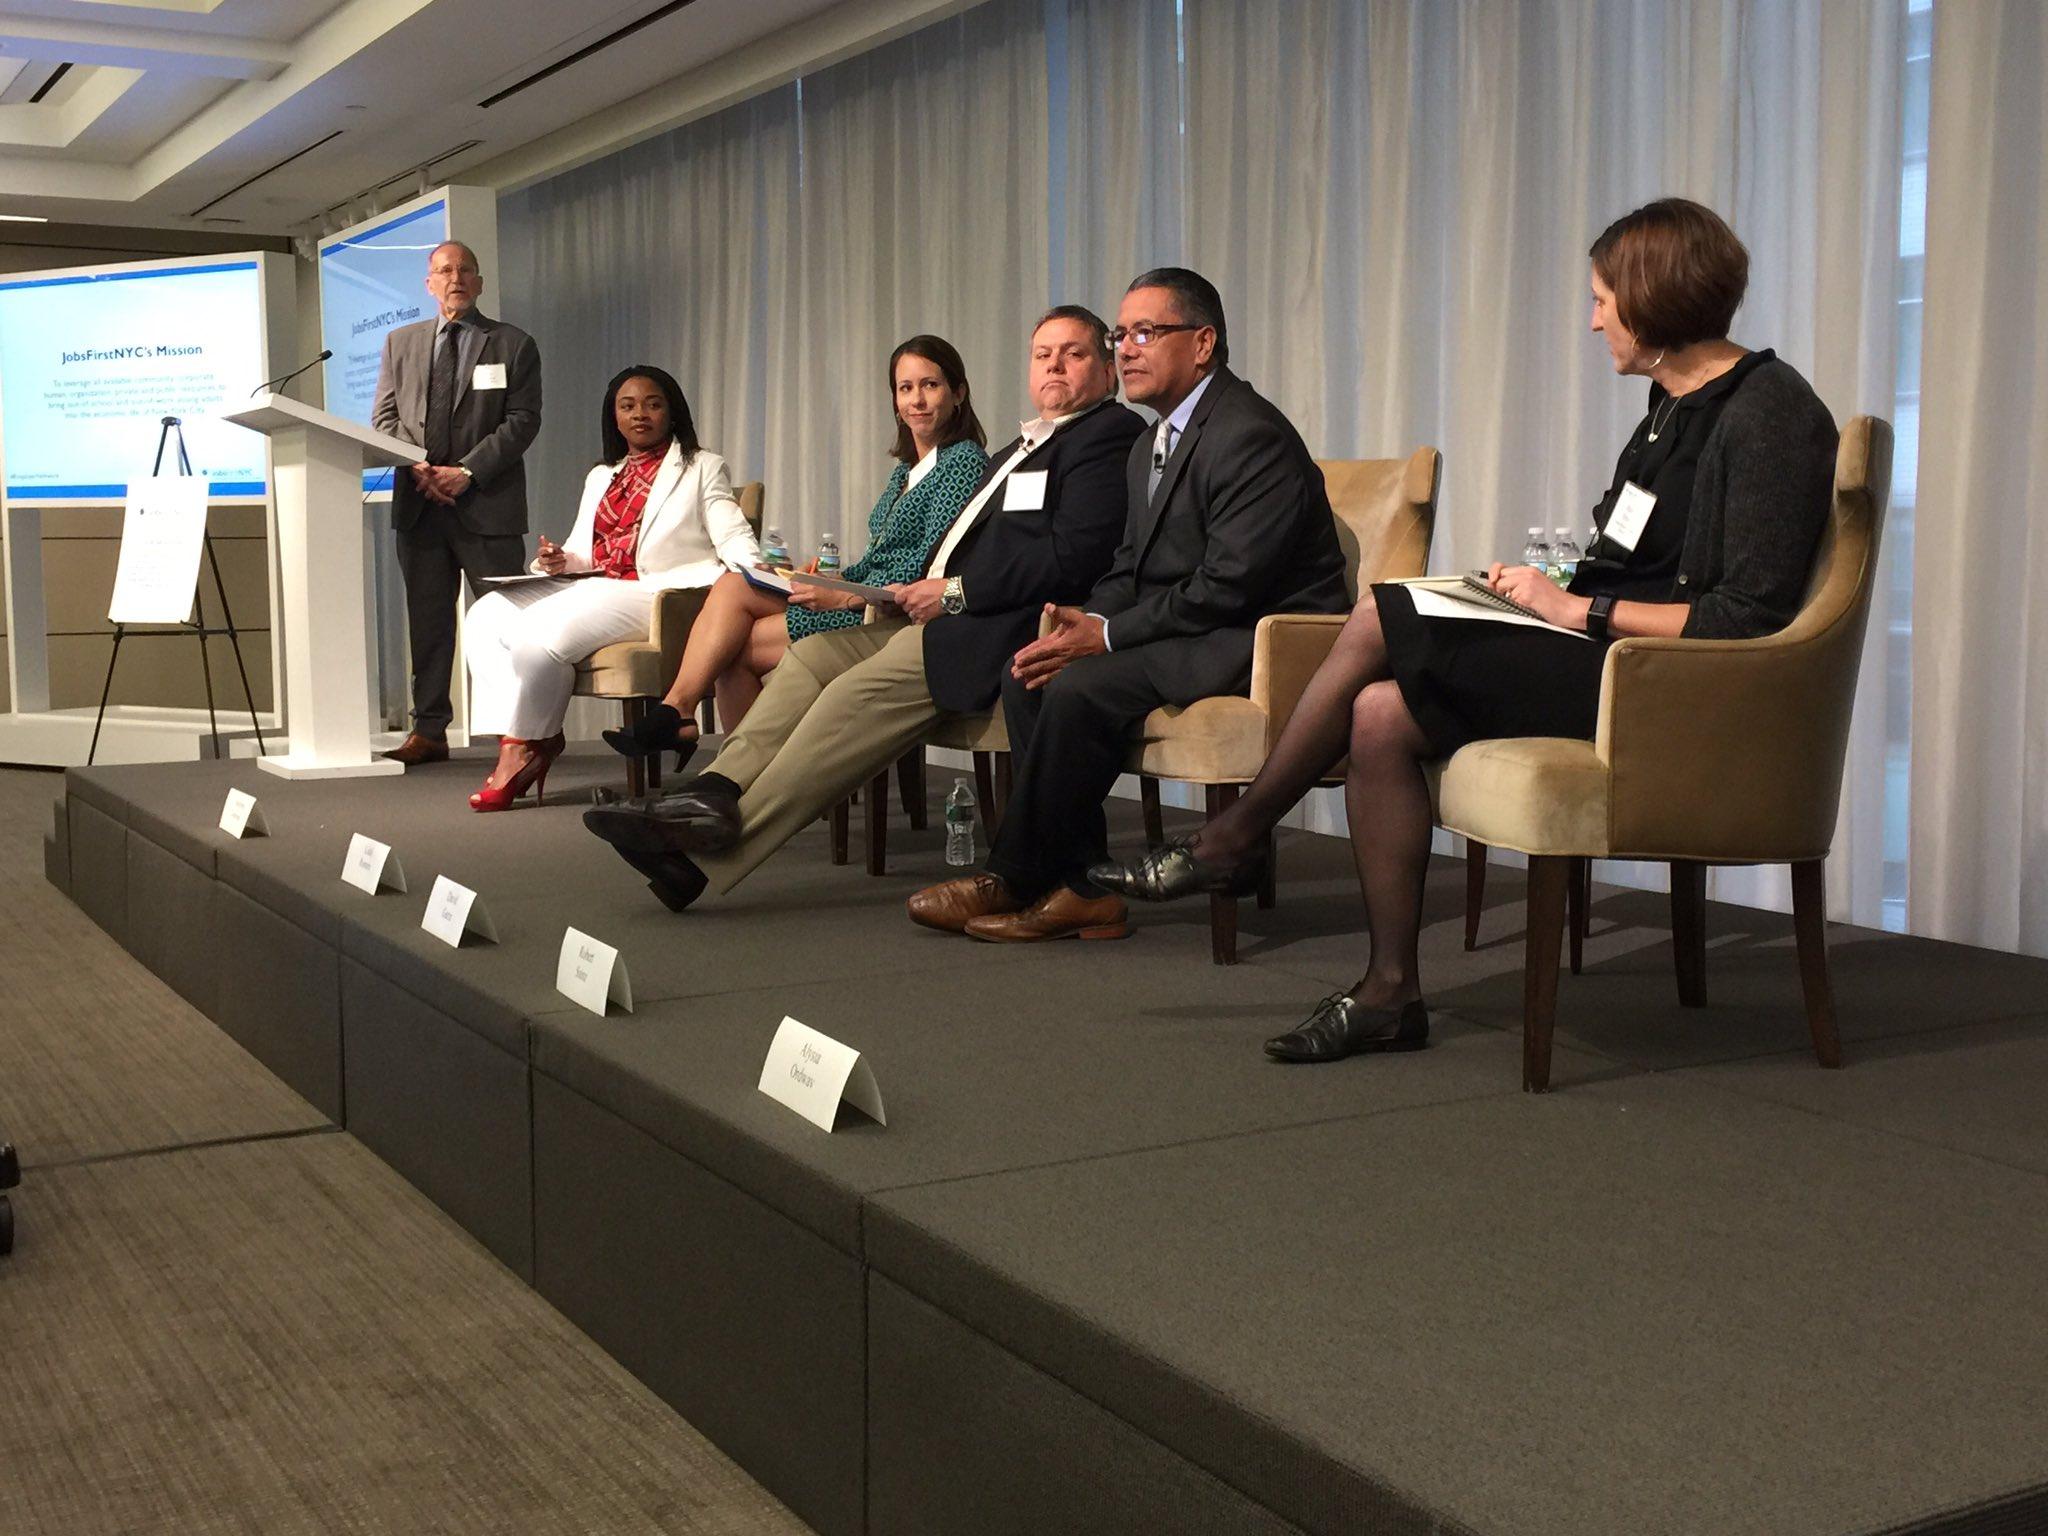 @PYNinc @WorkLife_CO @HenryStreet @BostonPIC talk #EmployerNetwork https://t.co/02ca2Nrd0L